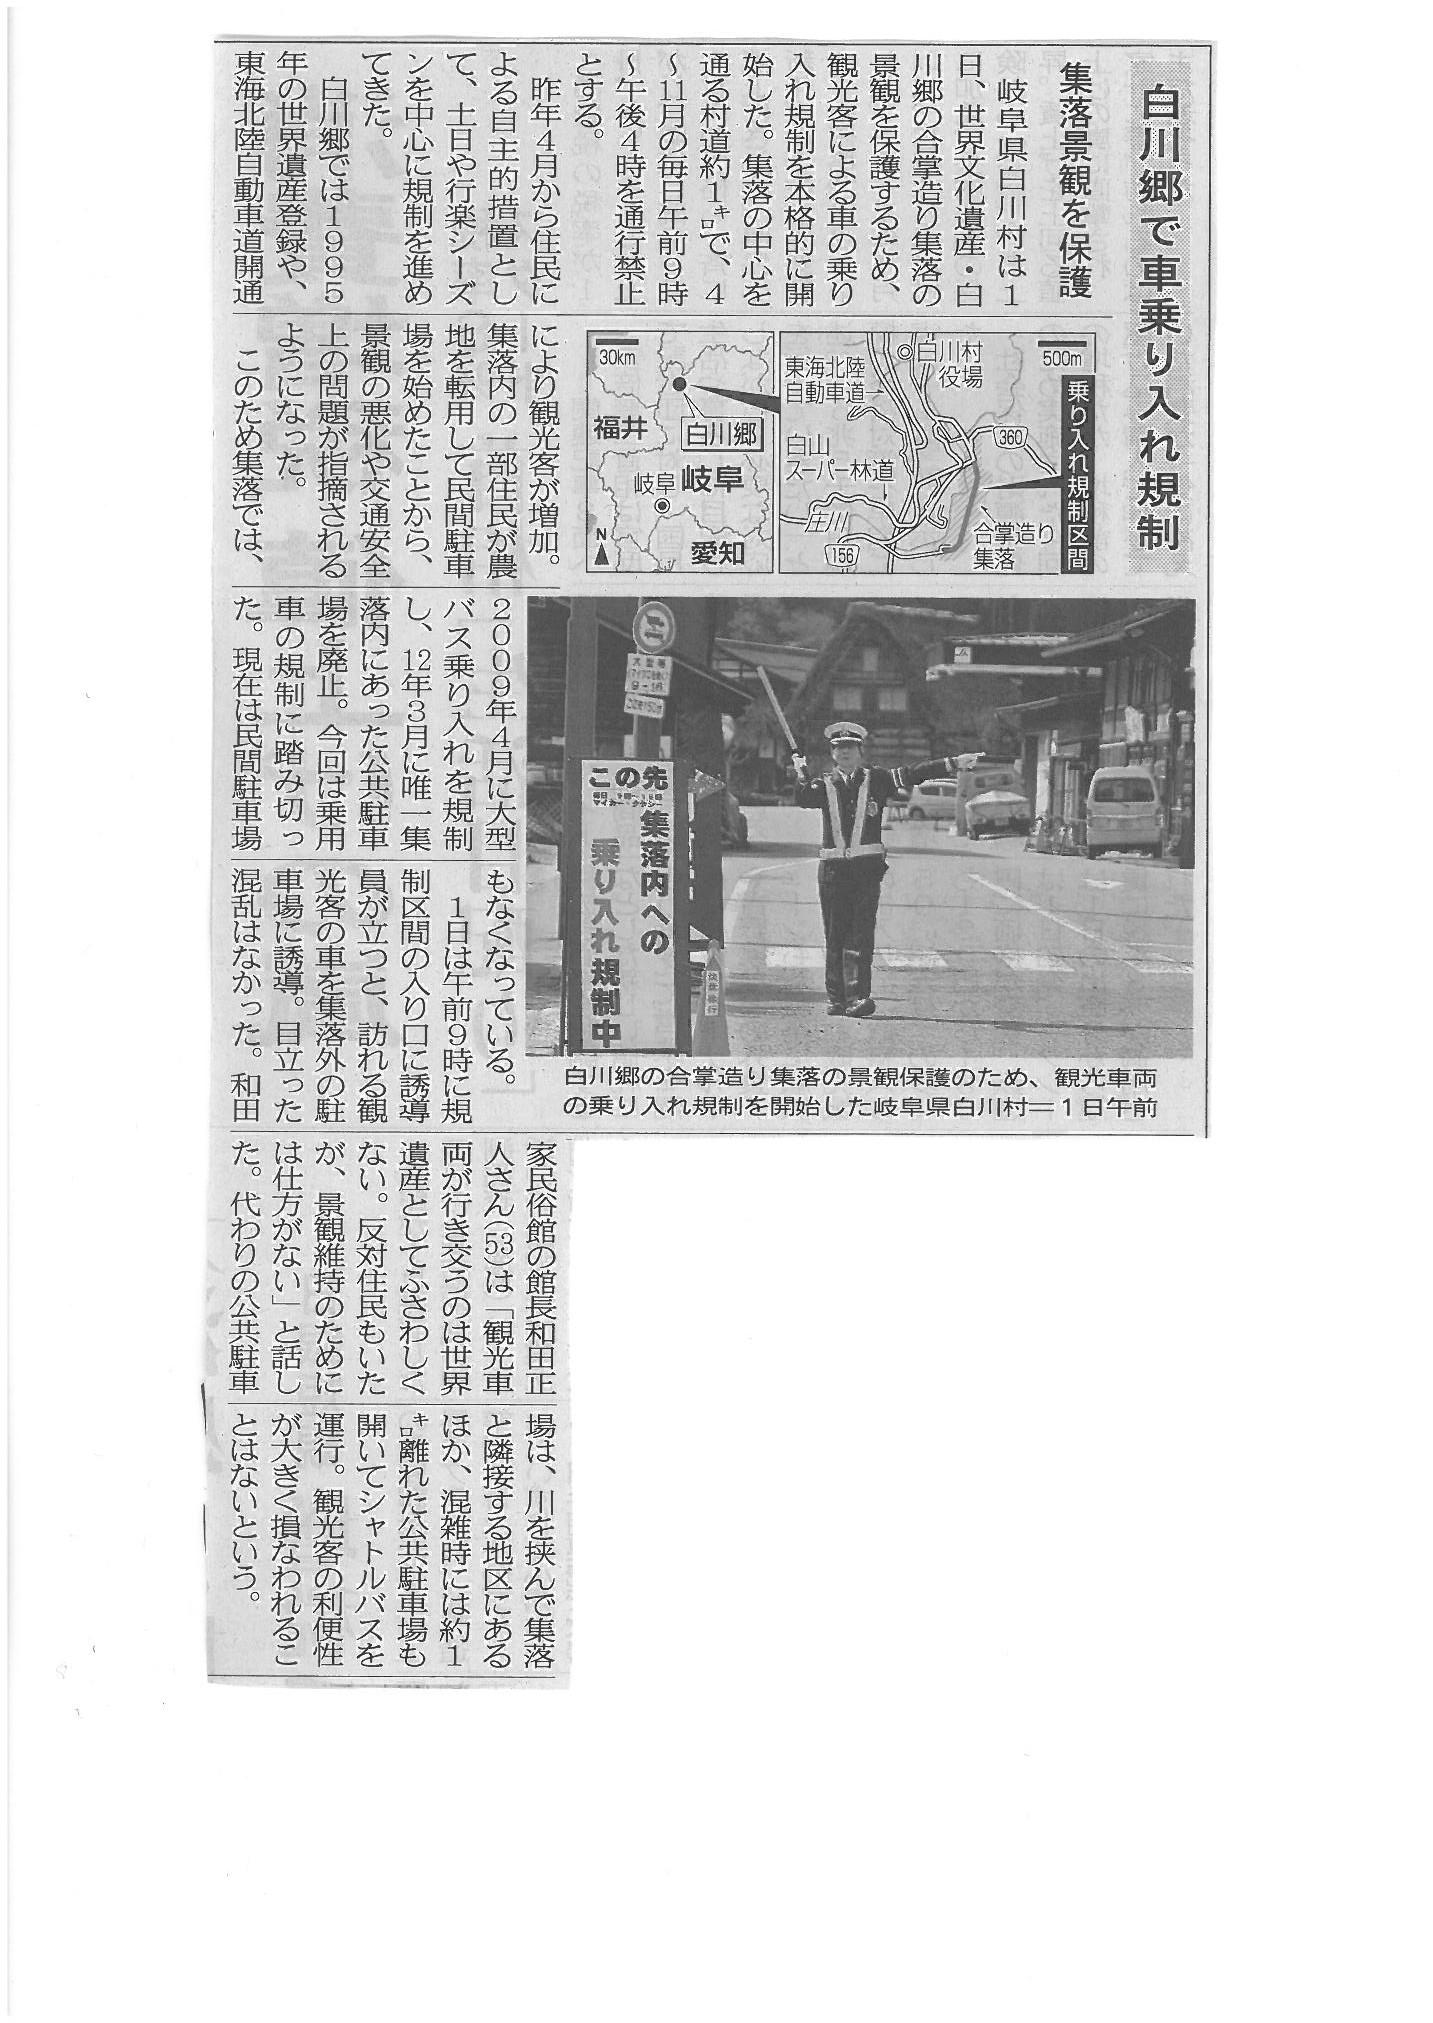 http://mtfuji.or.jp/img/media/_old/img/SKMBT_C22014040314180.jpg